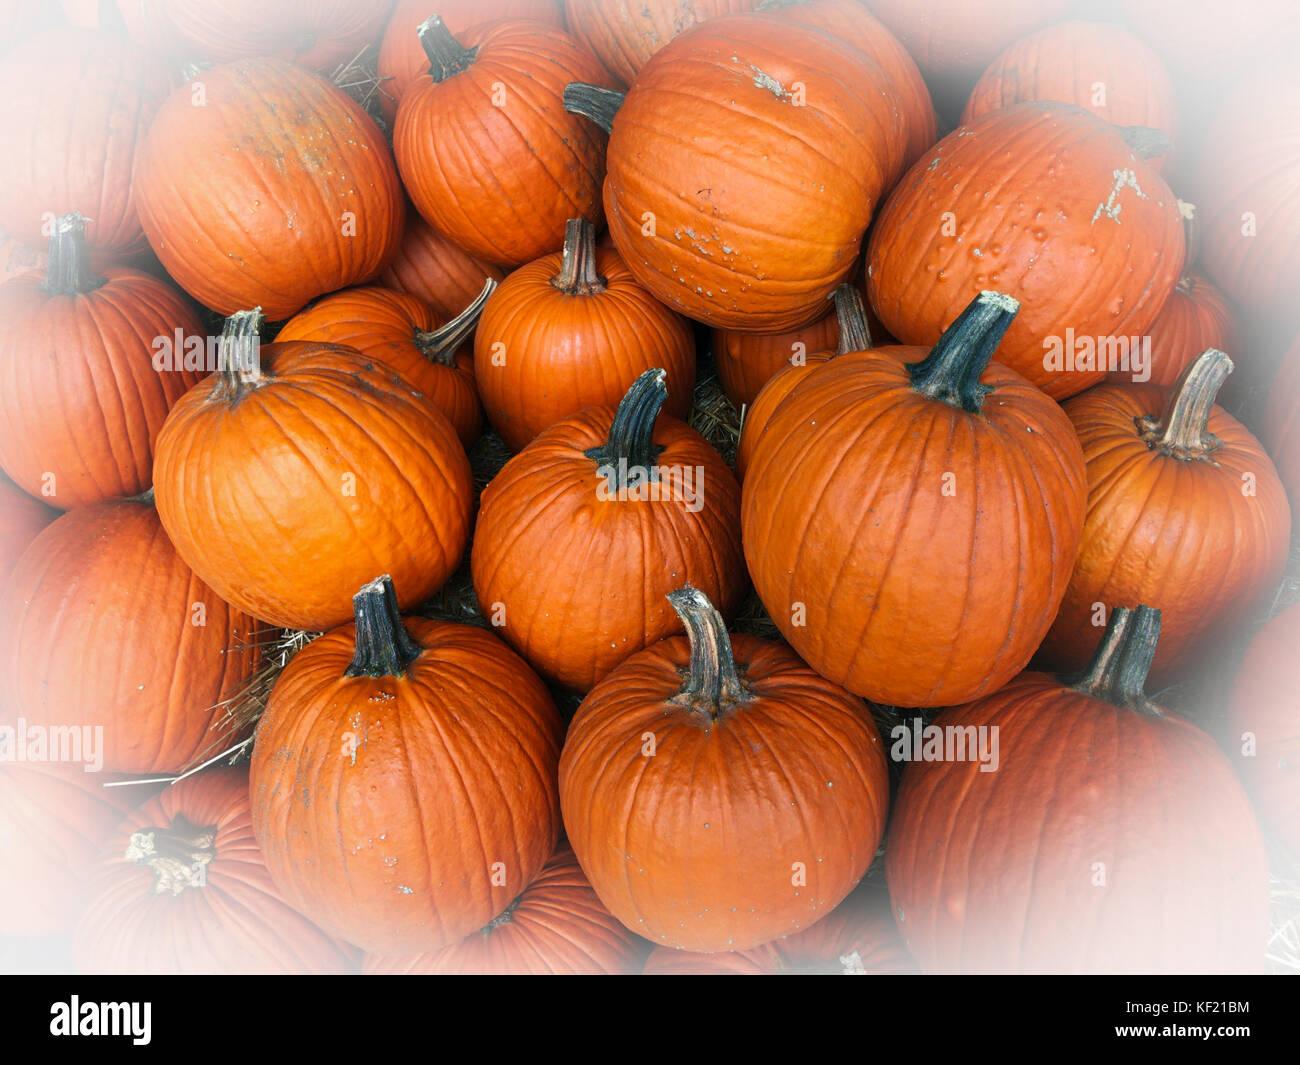 Festive Pile Of Orange Autumn Pumpkins At A Farmeru0027s Market Ready For  Halloween Holiday